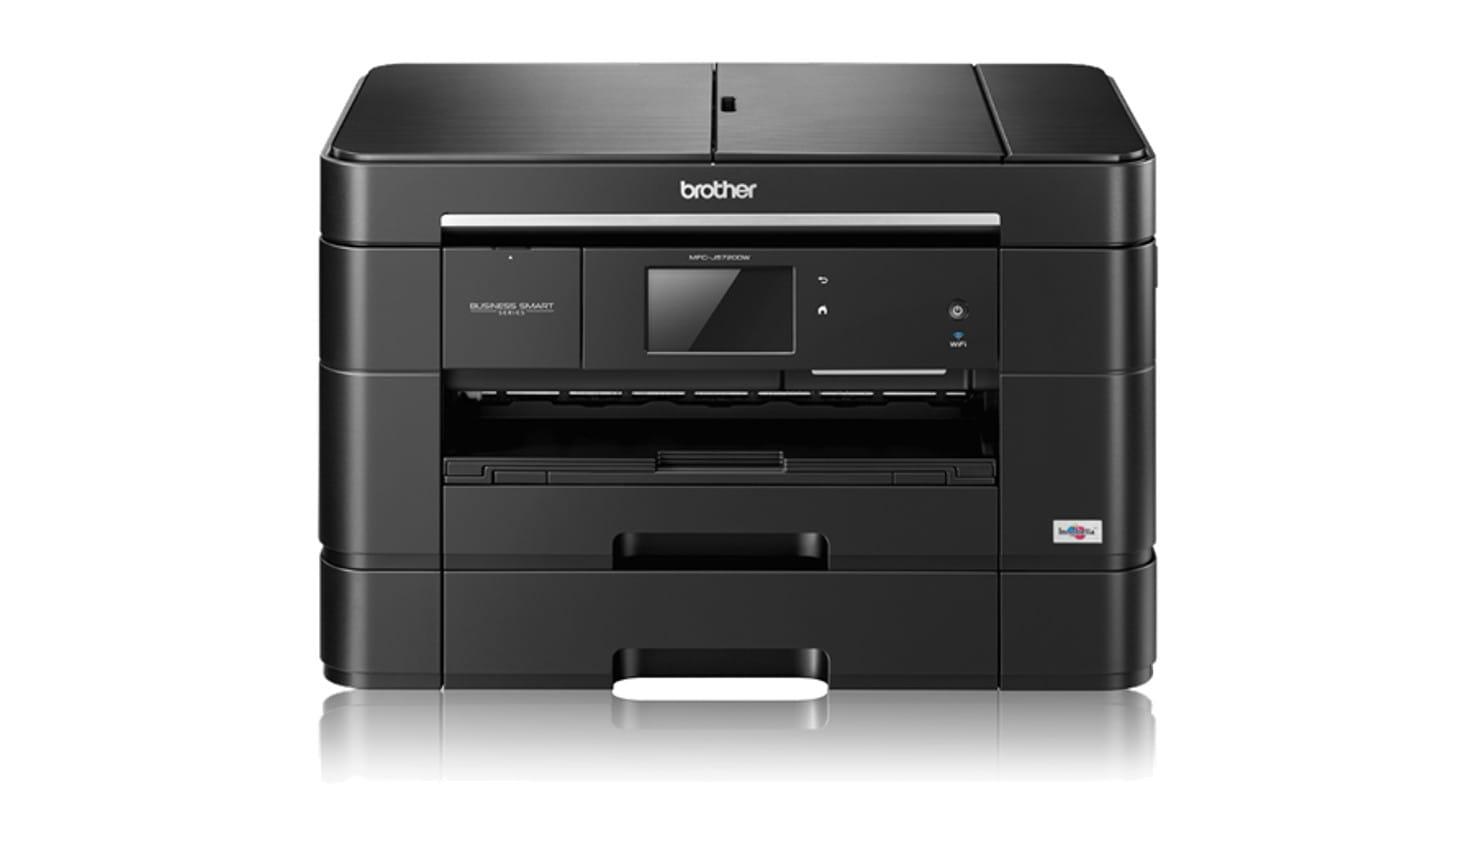 Impresora multifunción tinta MFC-J5720DW